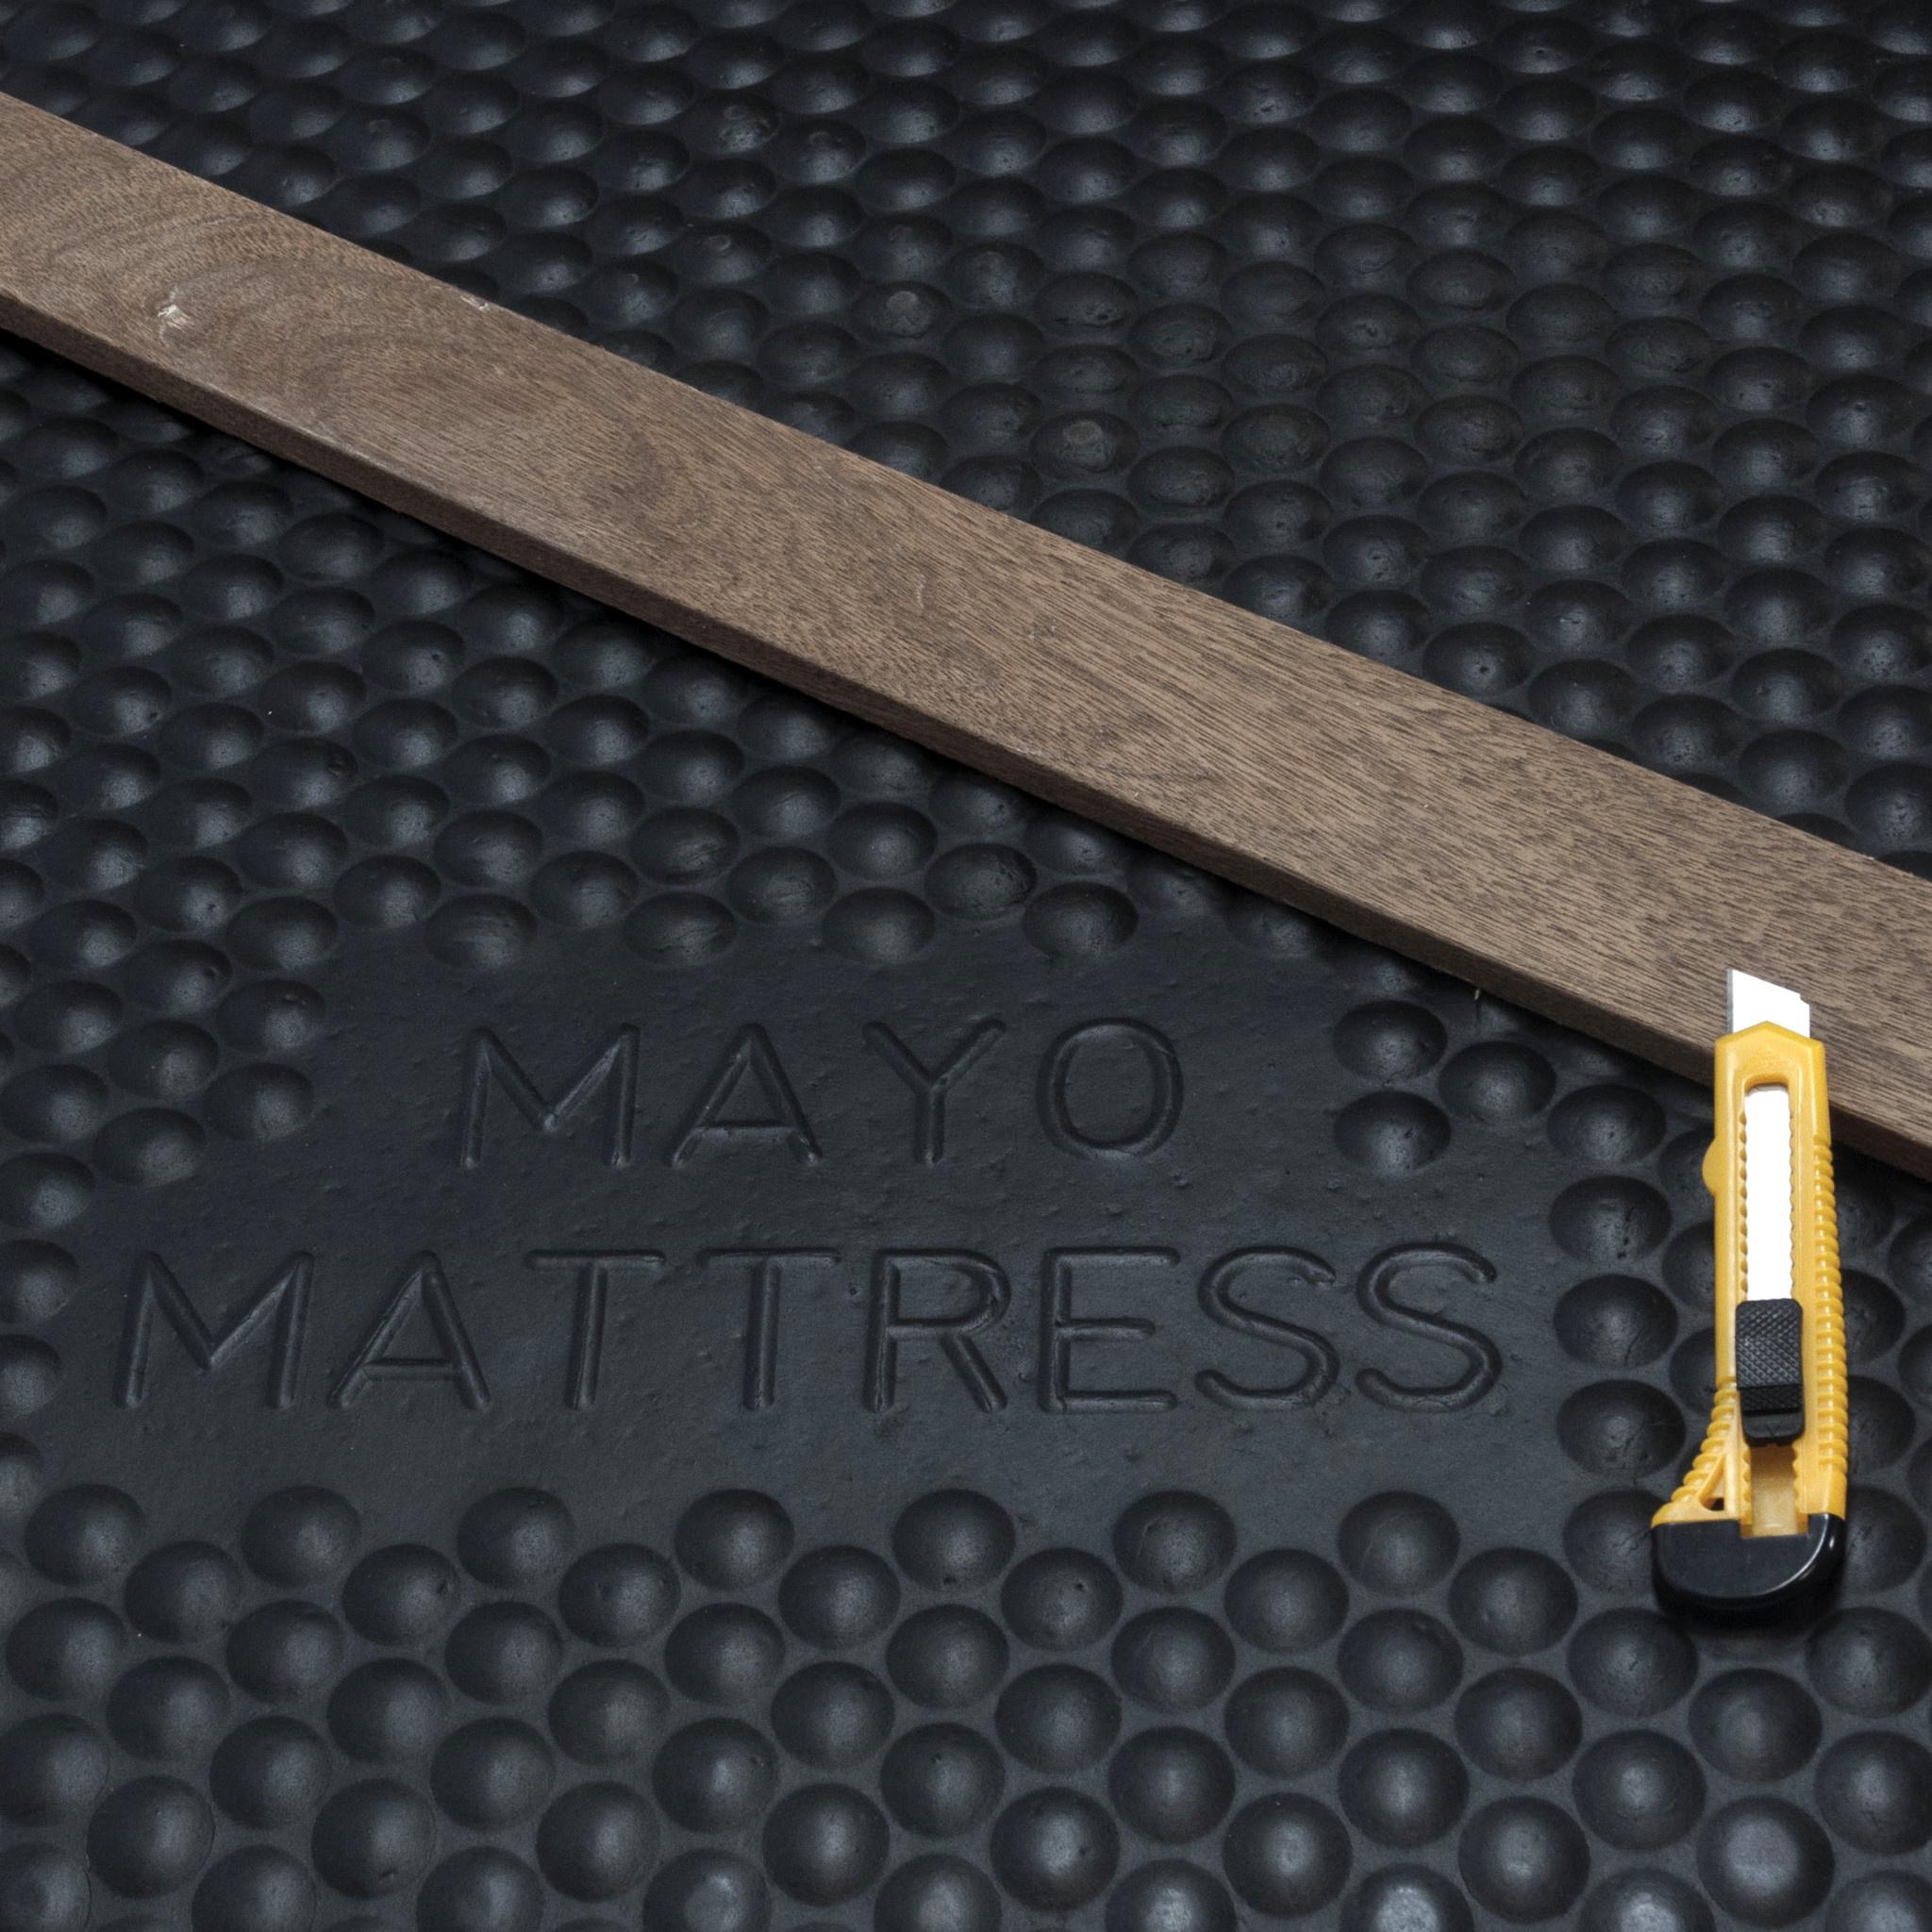 Mayo MAYO Pferdematratze 1,83 x 1,20 m